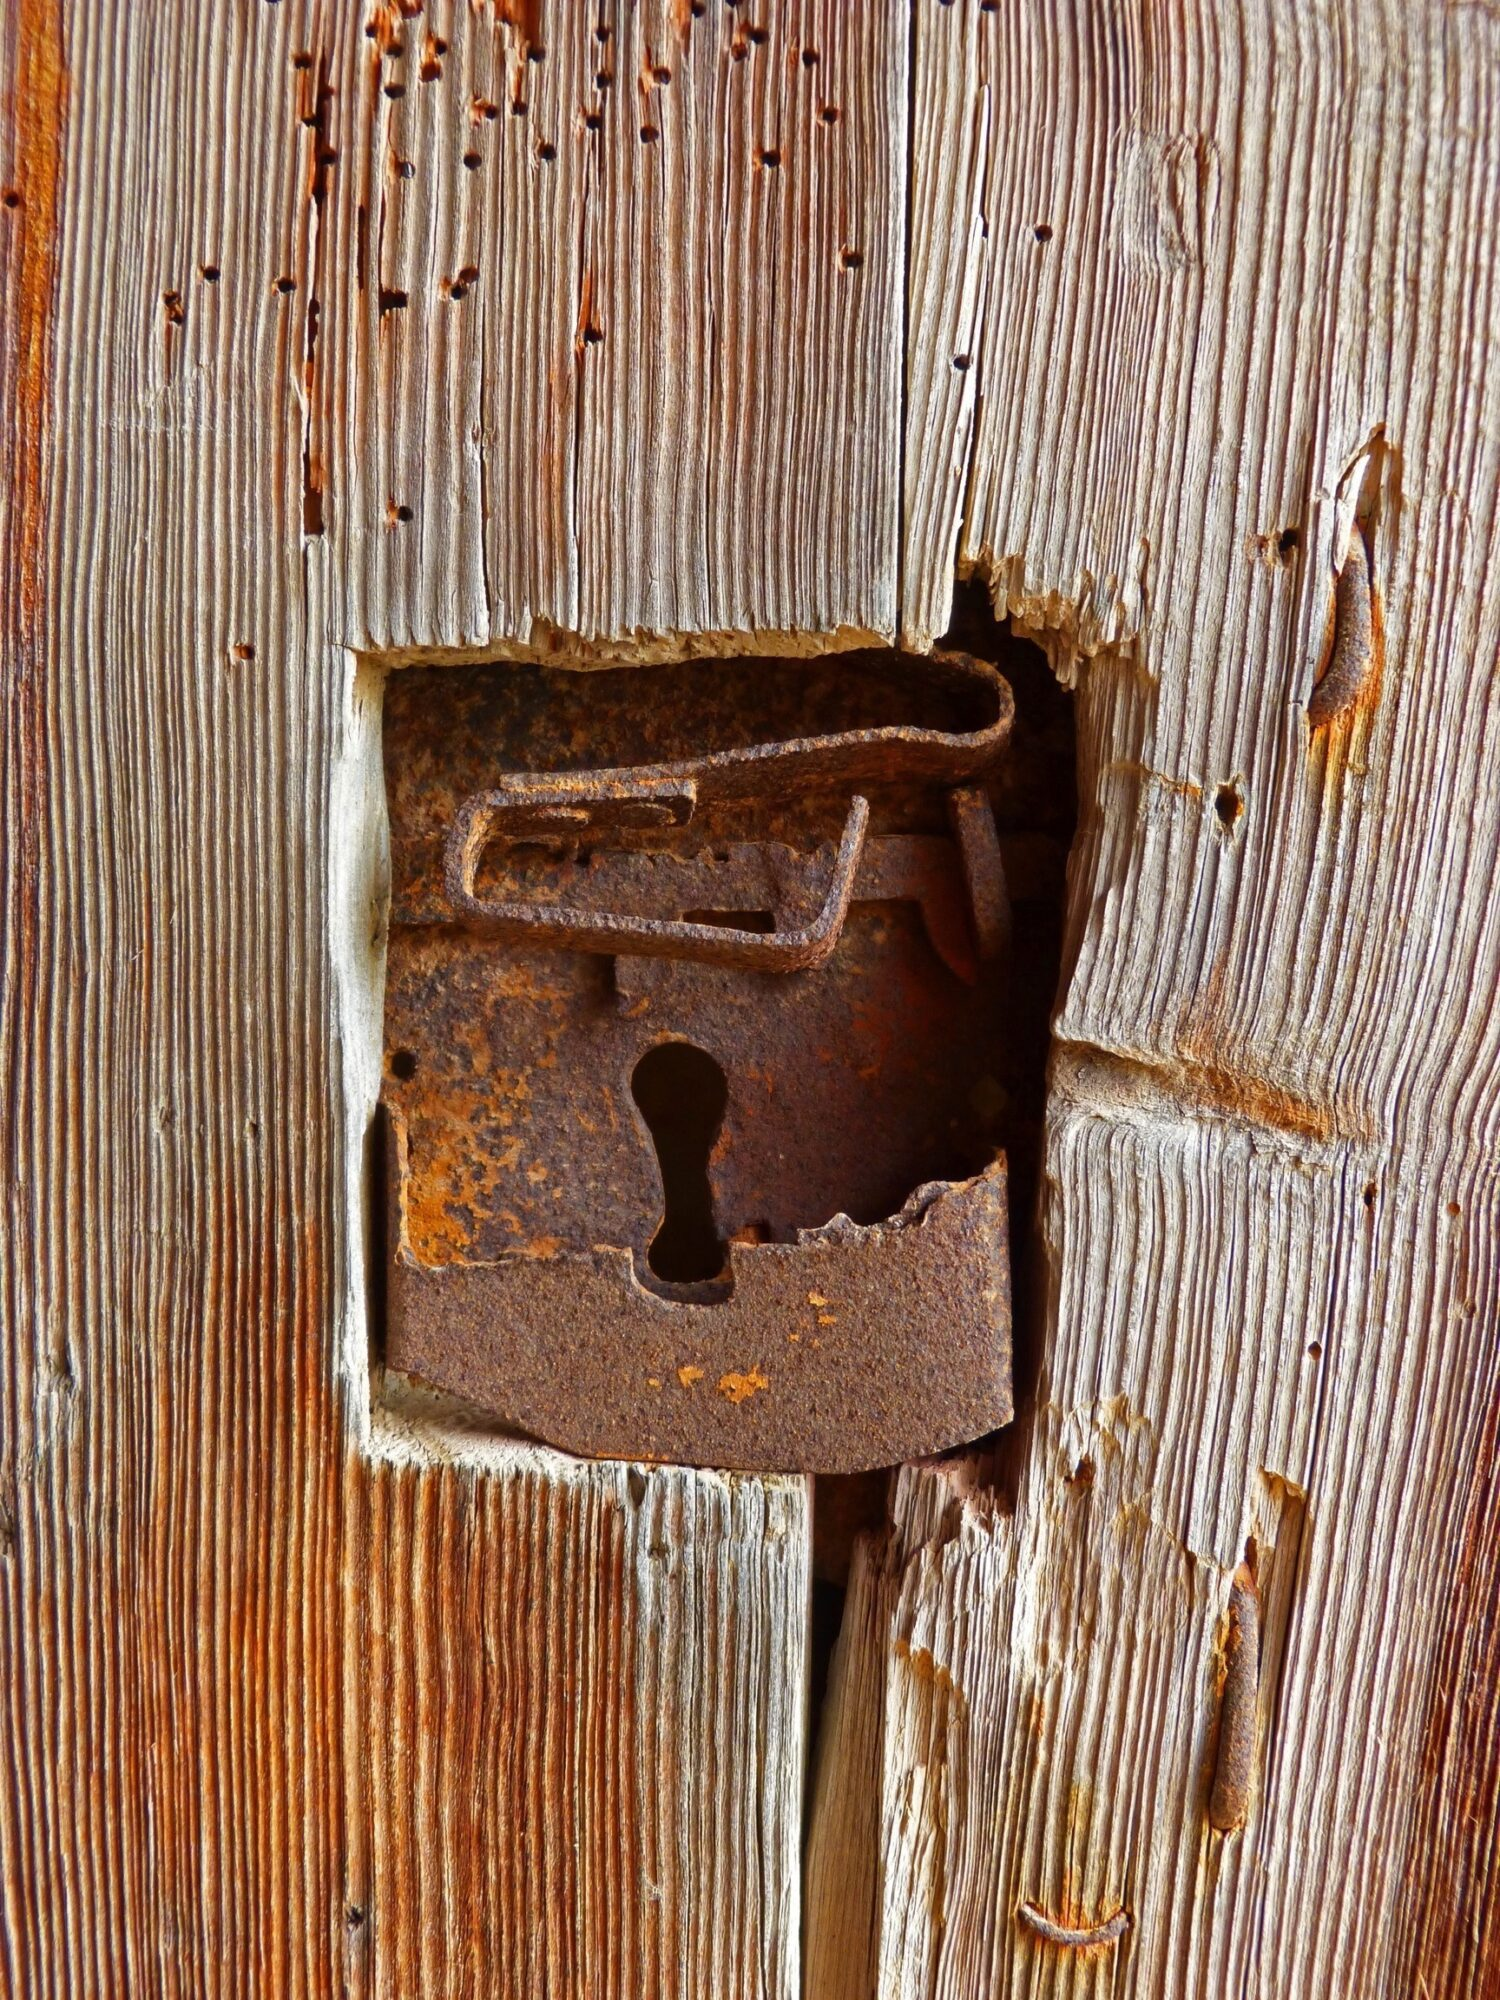 lock problems